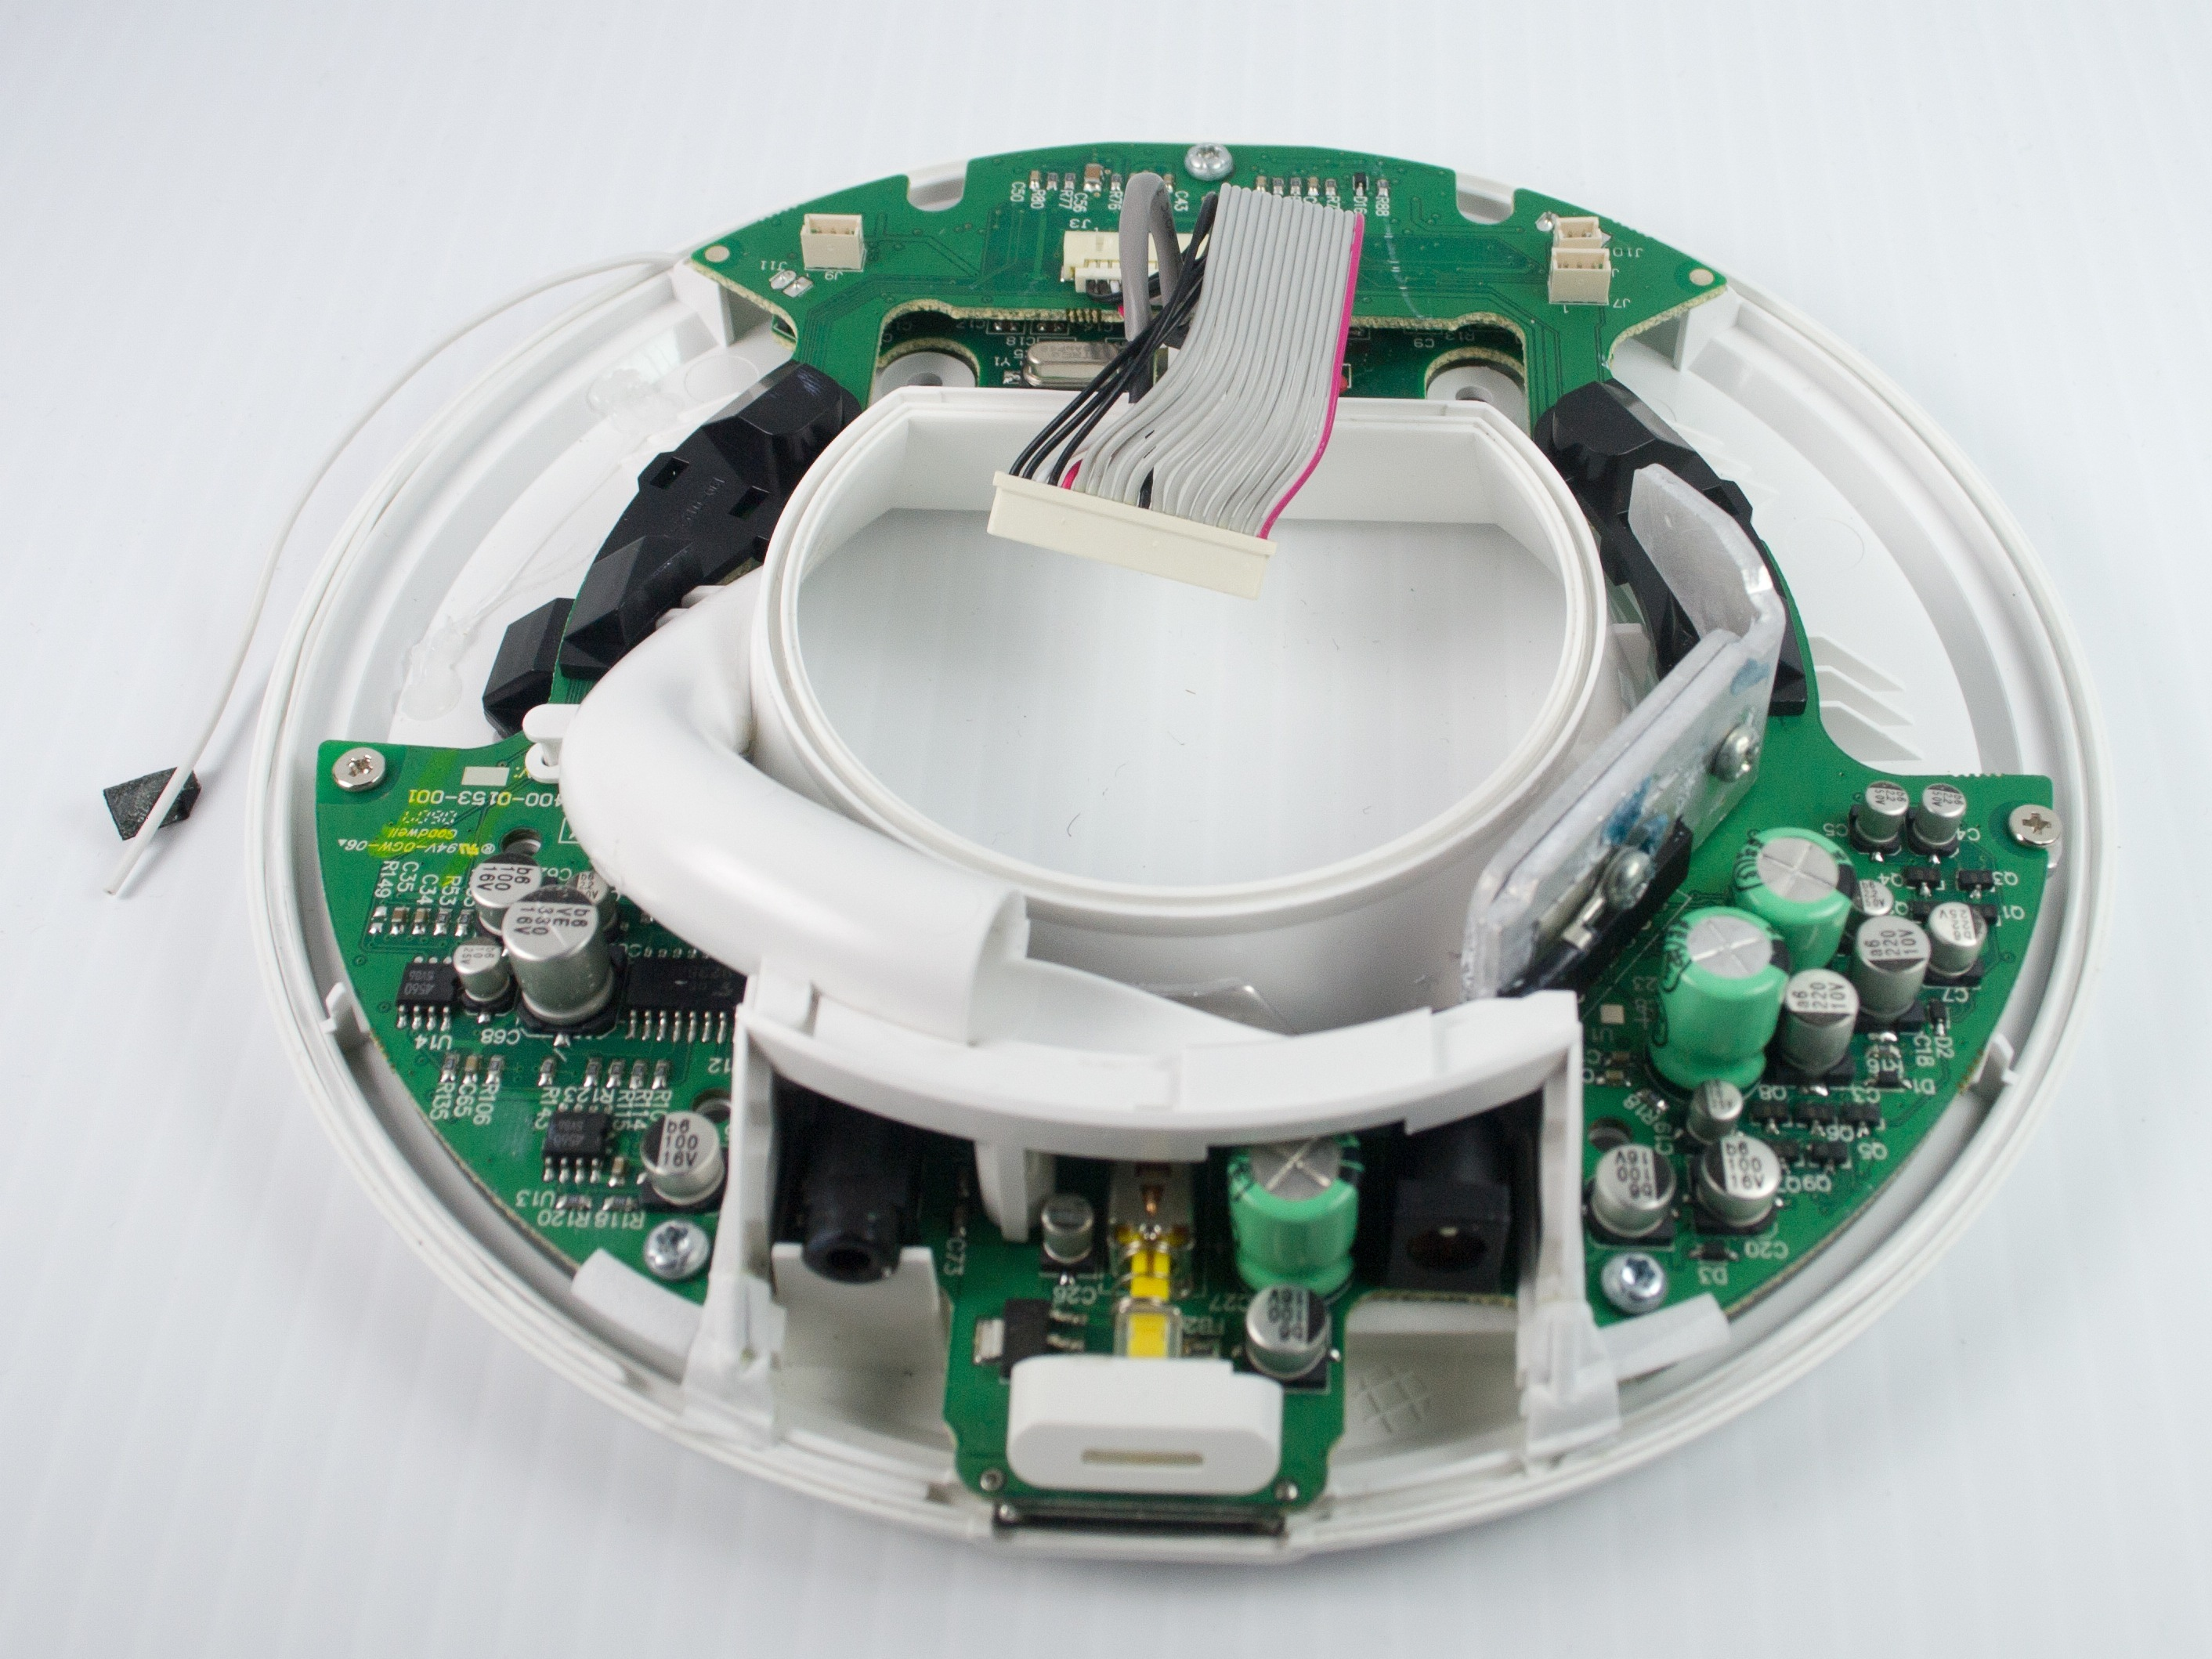 Disassembling The Circuit Board Ifixit Repair Guide Cut Pcb Cutter Manual For Cutting Metal